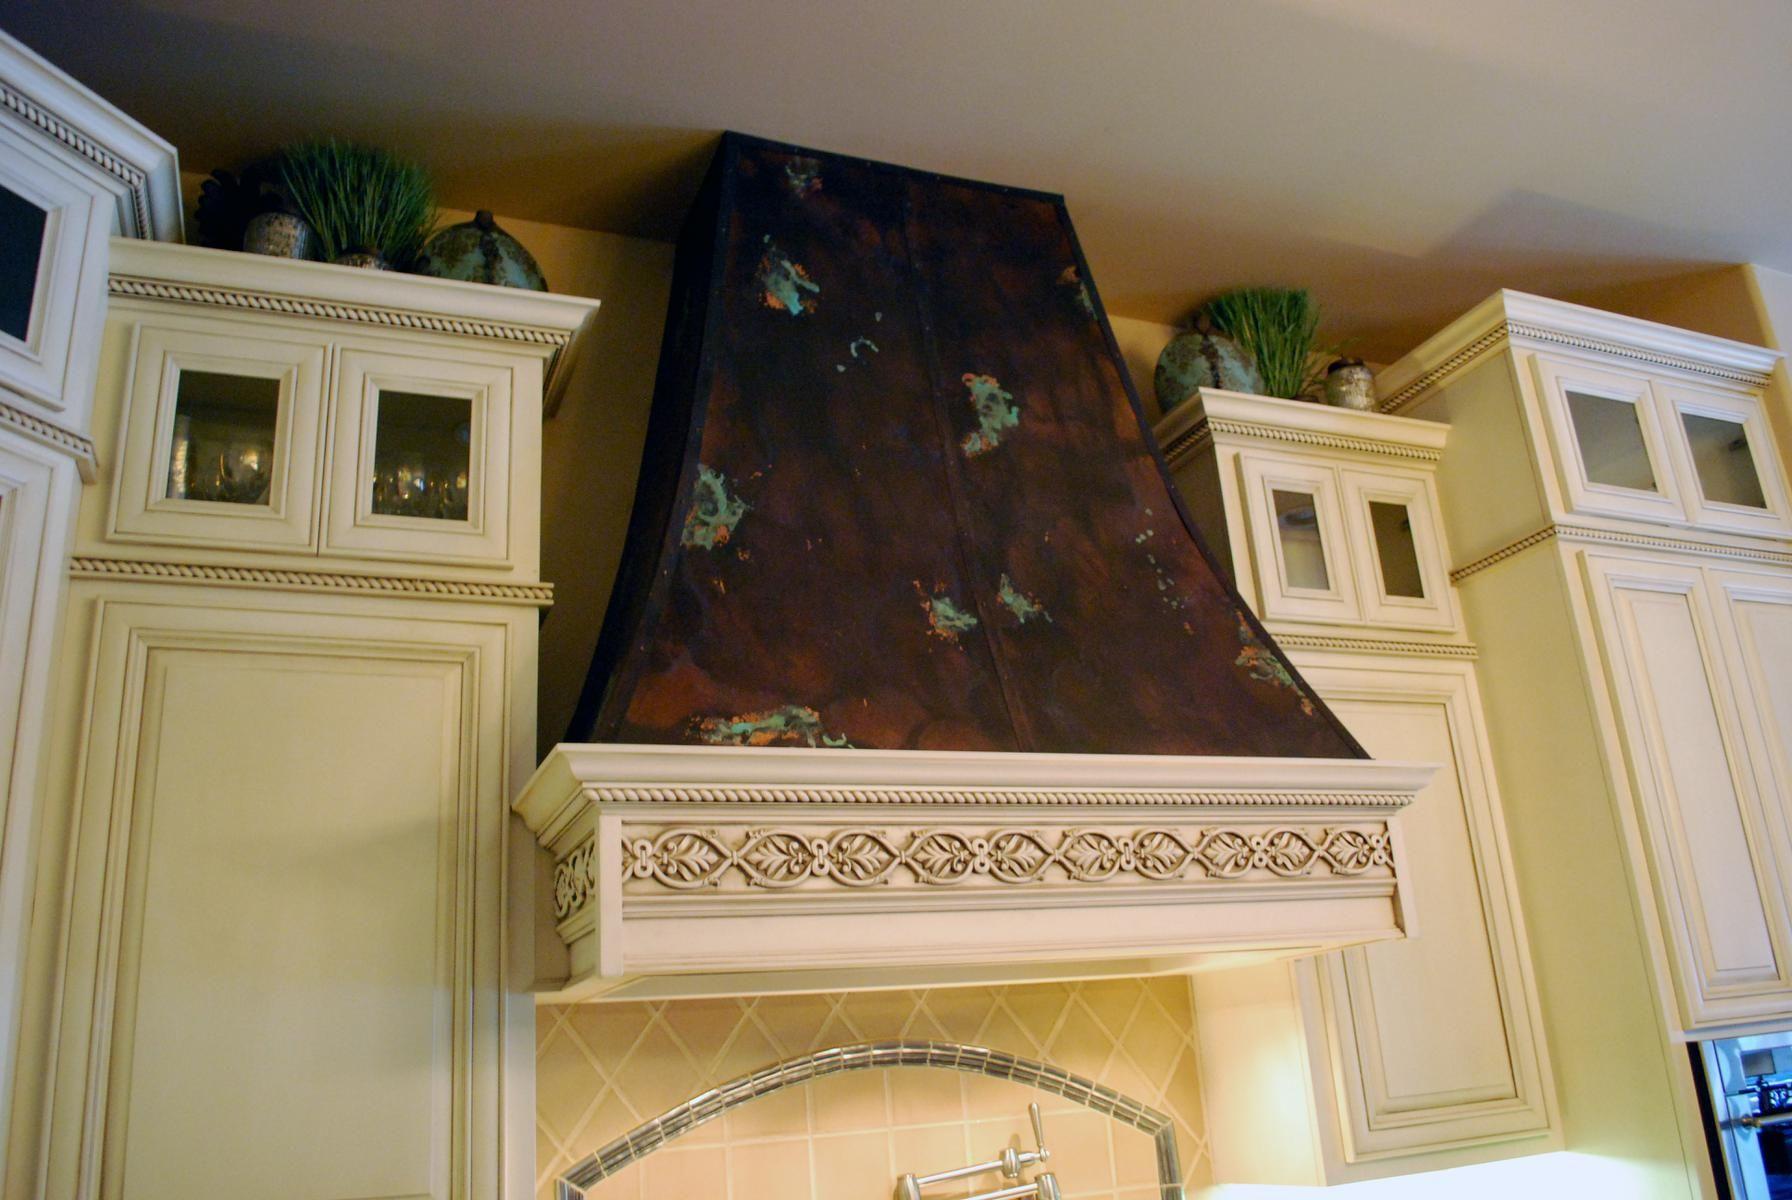 Custom Copper Range Hood And Frieze By Ck Valenti Designs